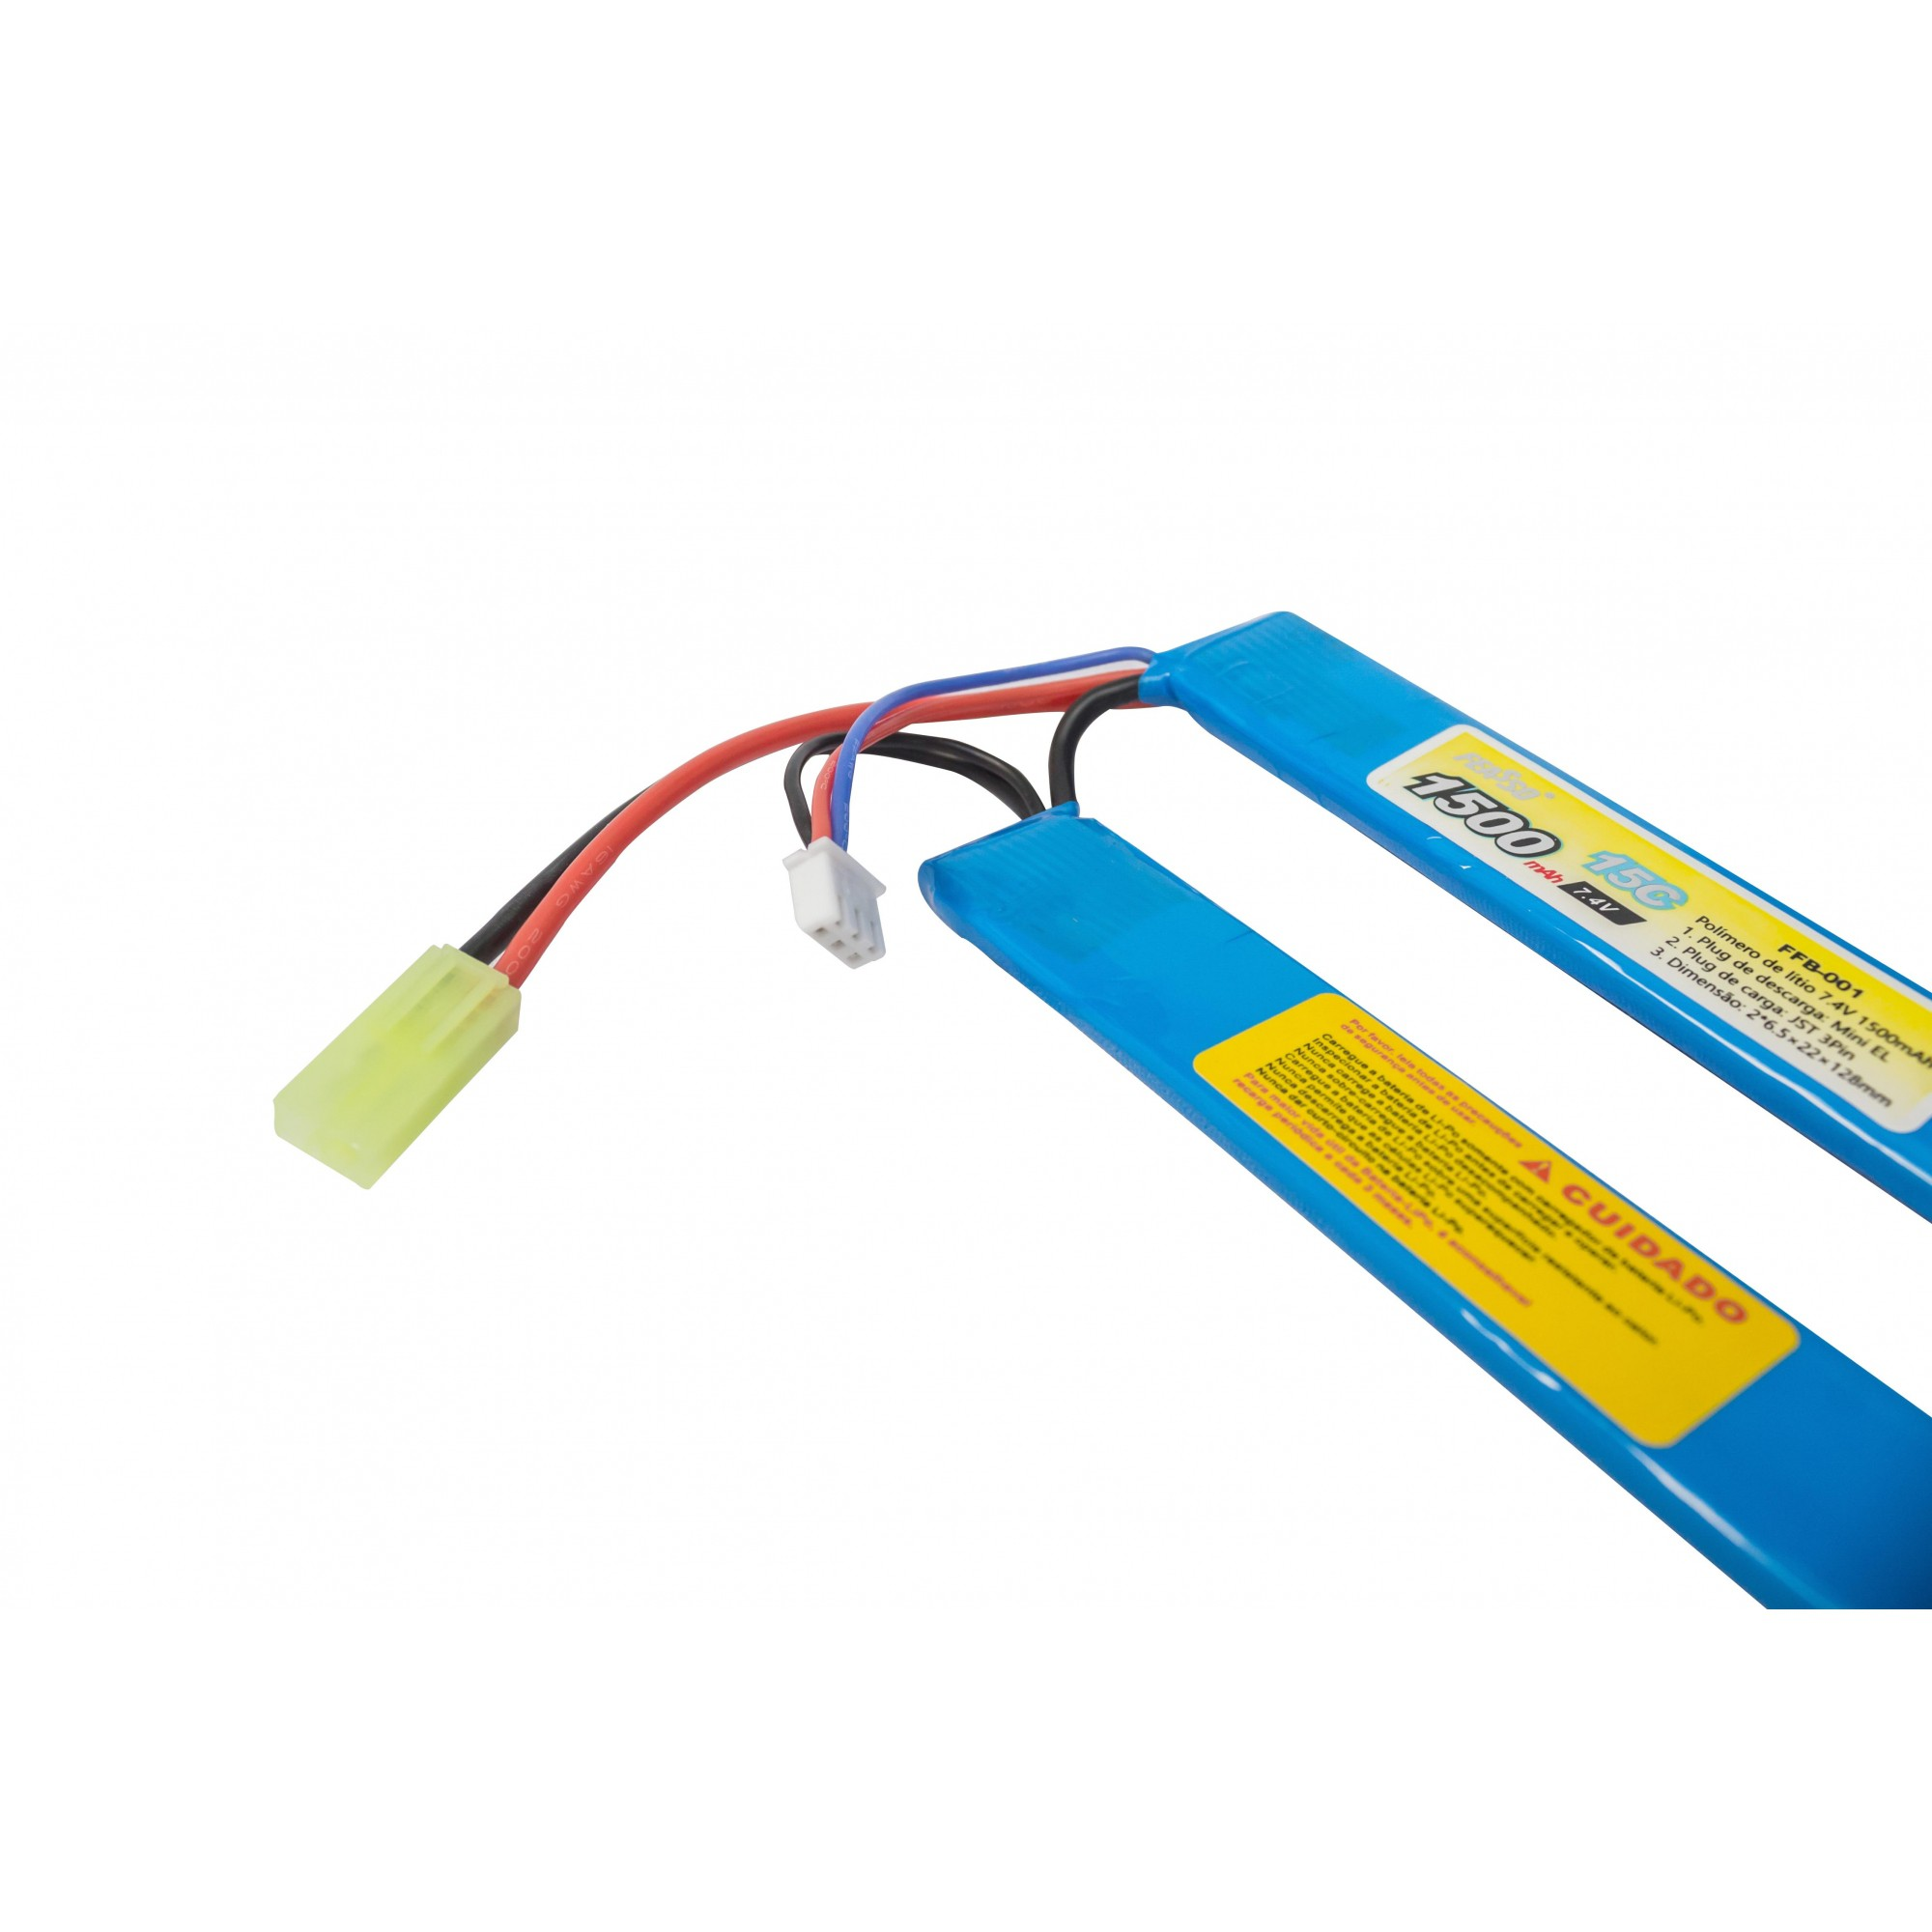 Bateria Lipo 7,4v 1500 Mha  Ffb-001